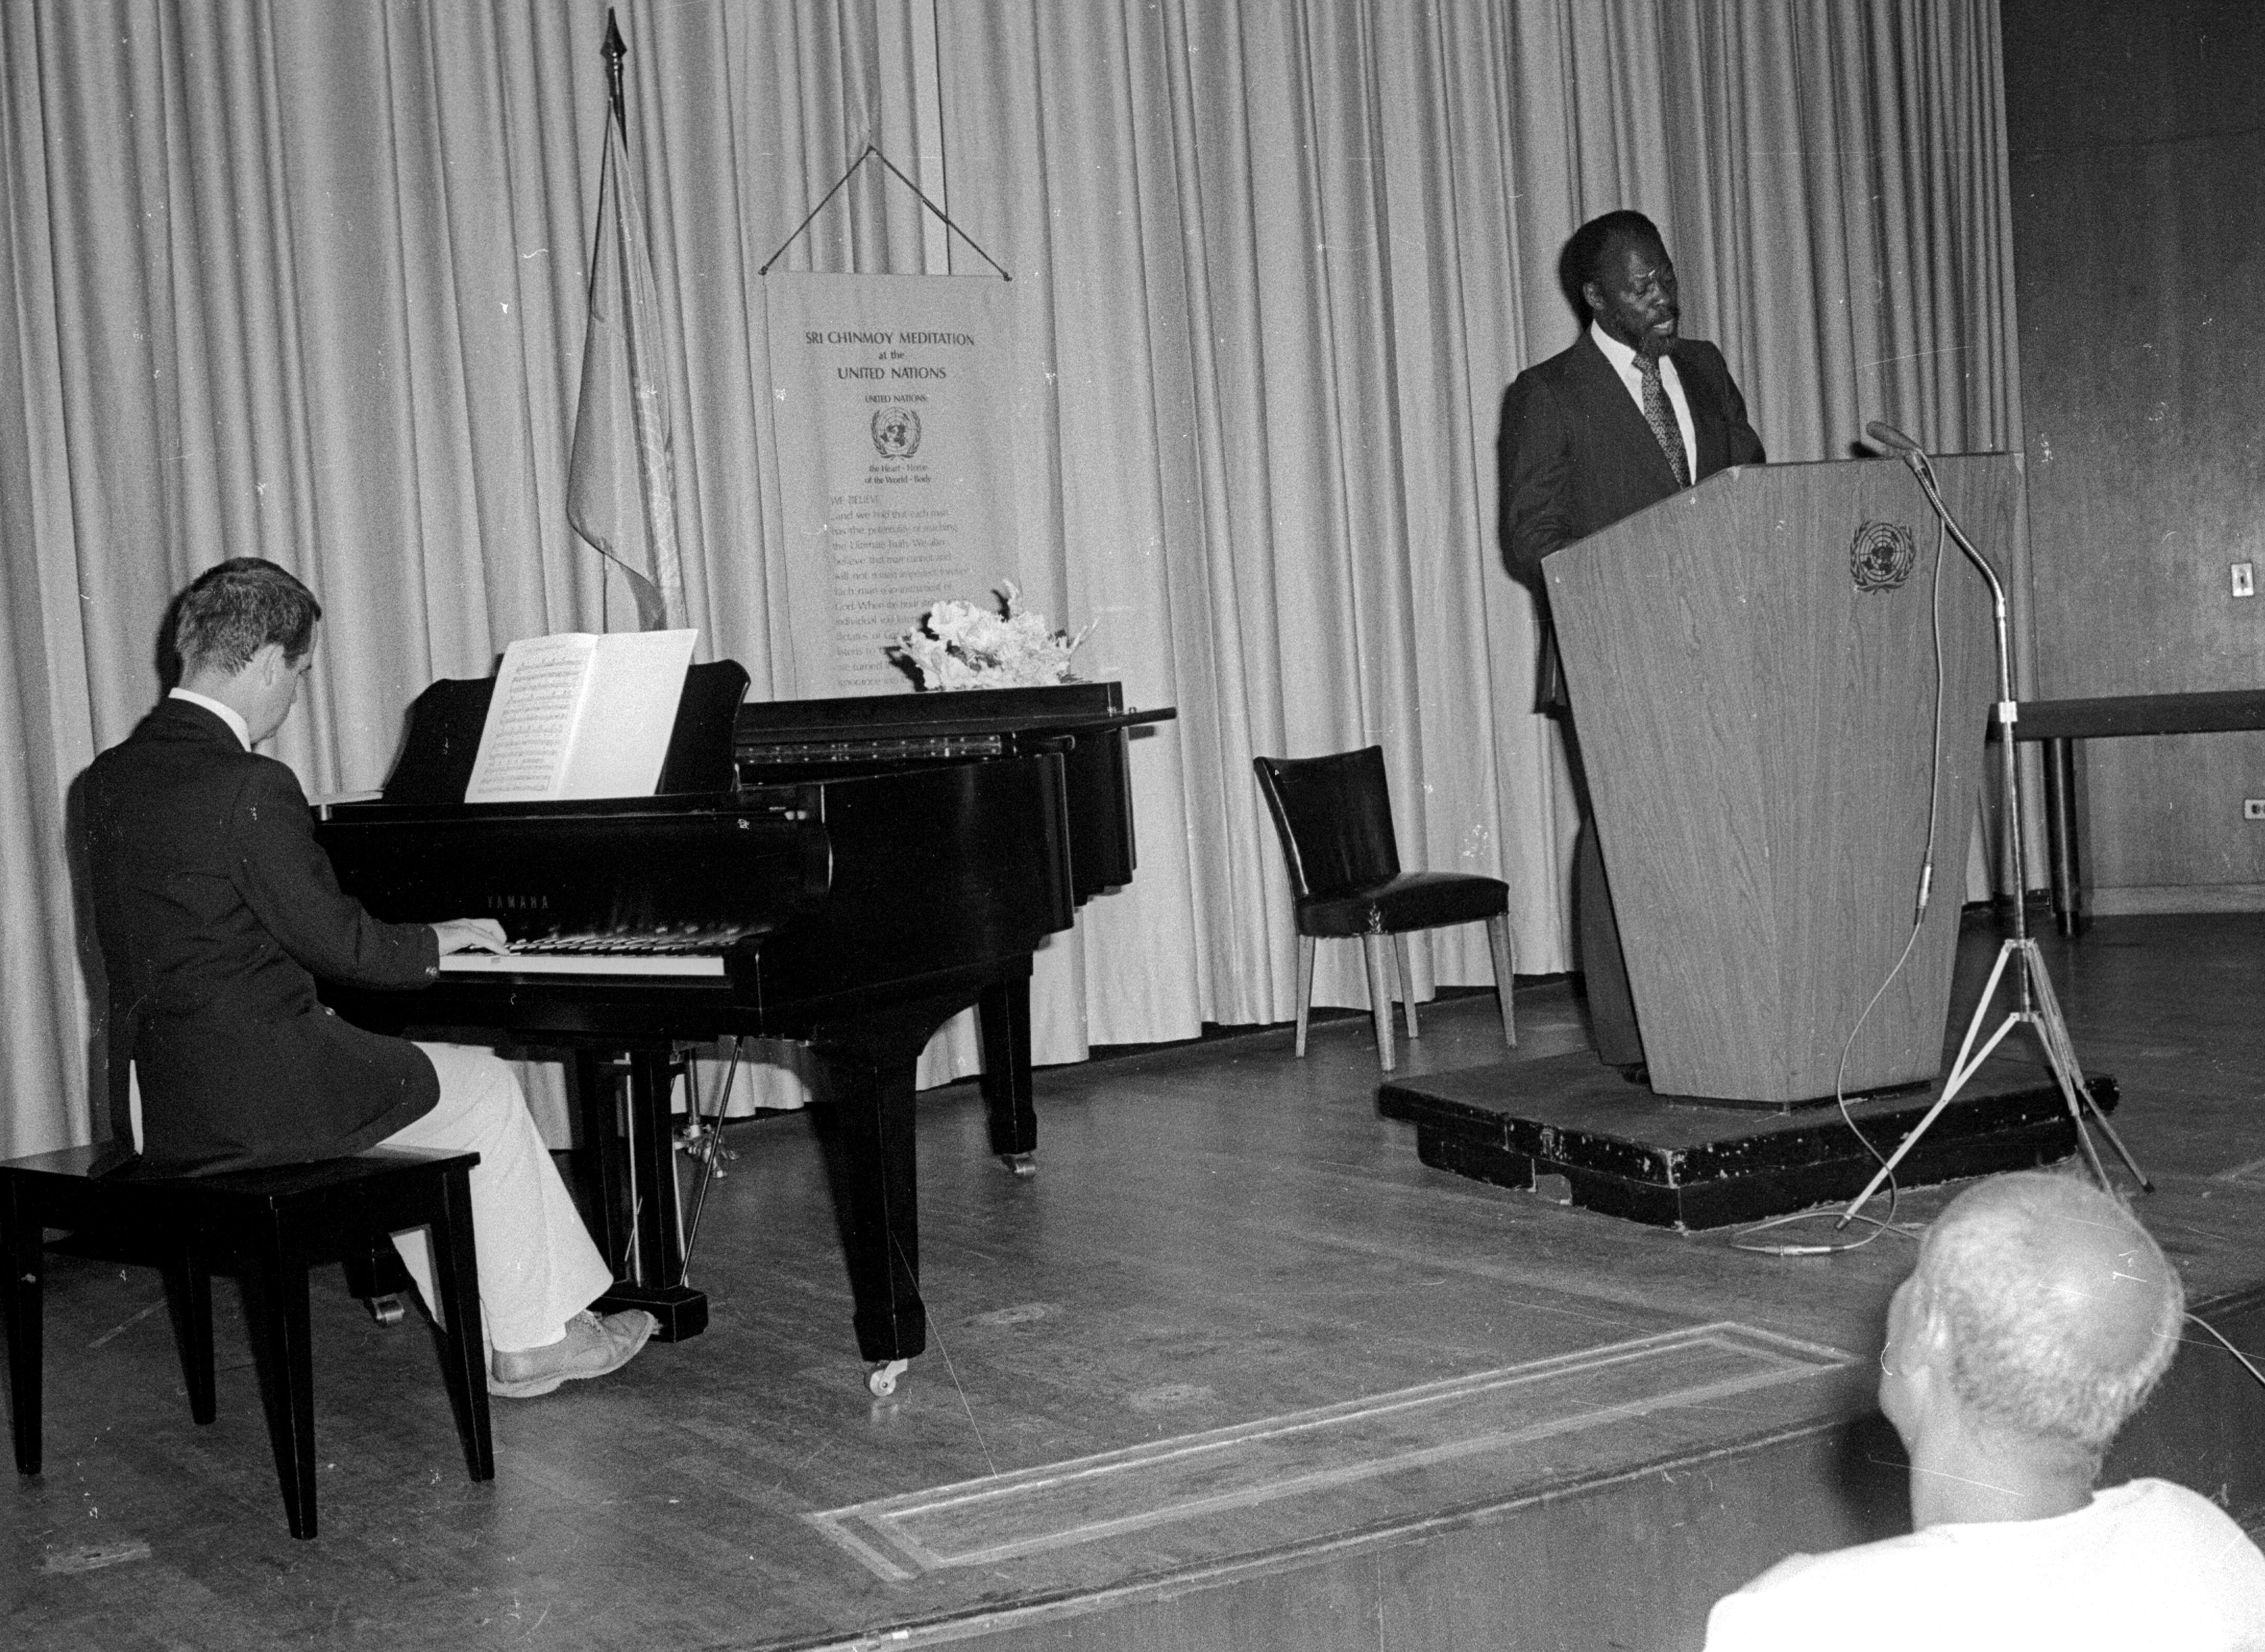 https://www.srichinmoypeacemeditationatun.org/wp-content/uploads/1980/09/1980-09-06-06-D.-L.-Hepburn-PR-Bahamas-sep-05-Sings-O-Greif-piano.jpg